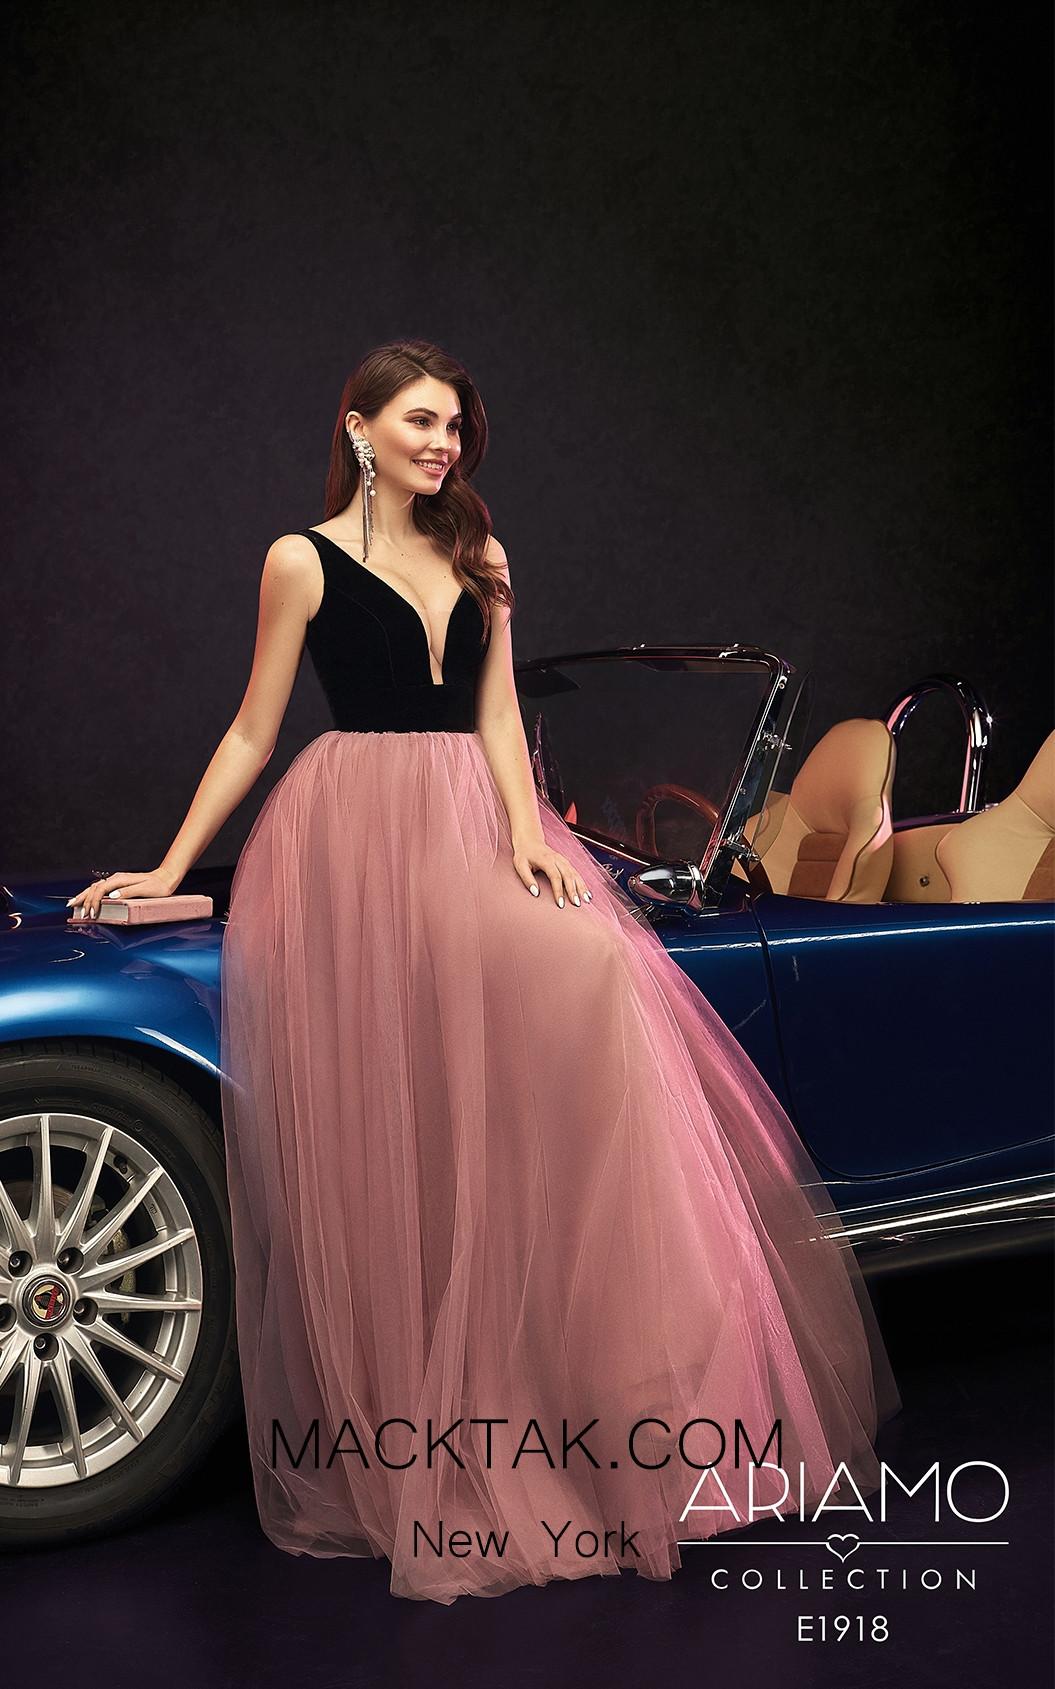 Ariamo E1918 Front Dress